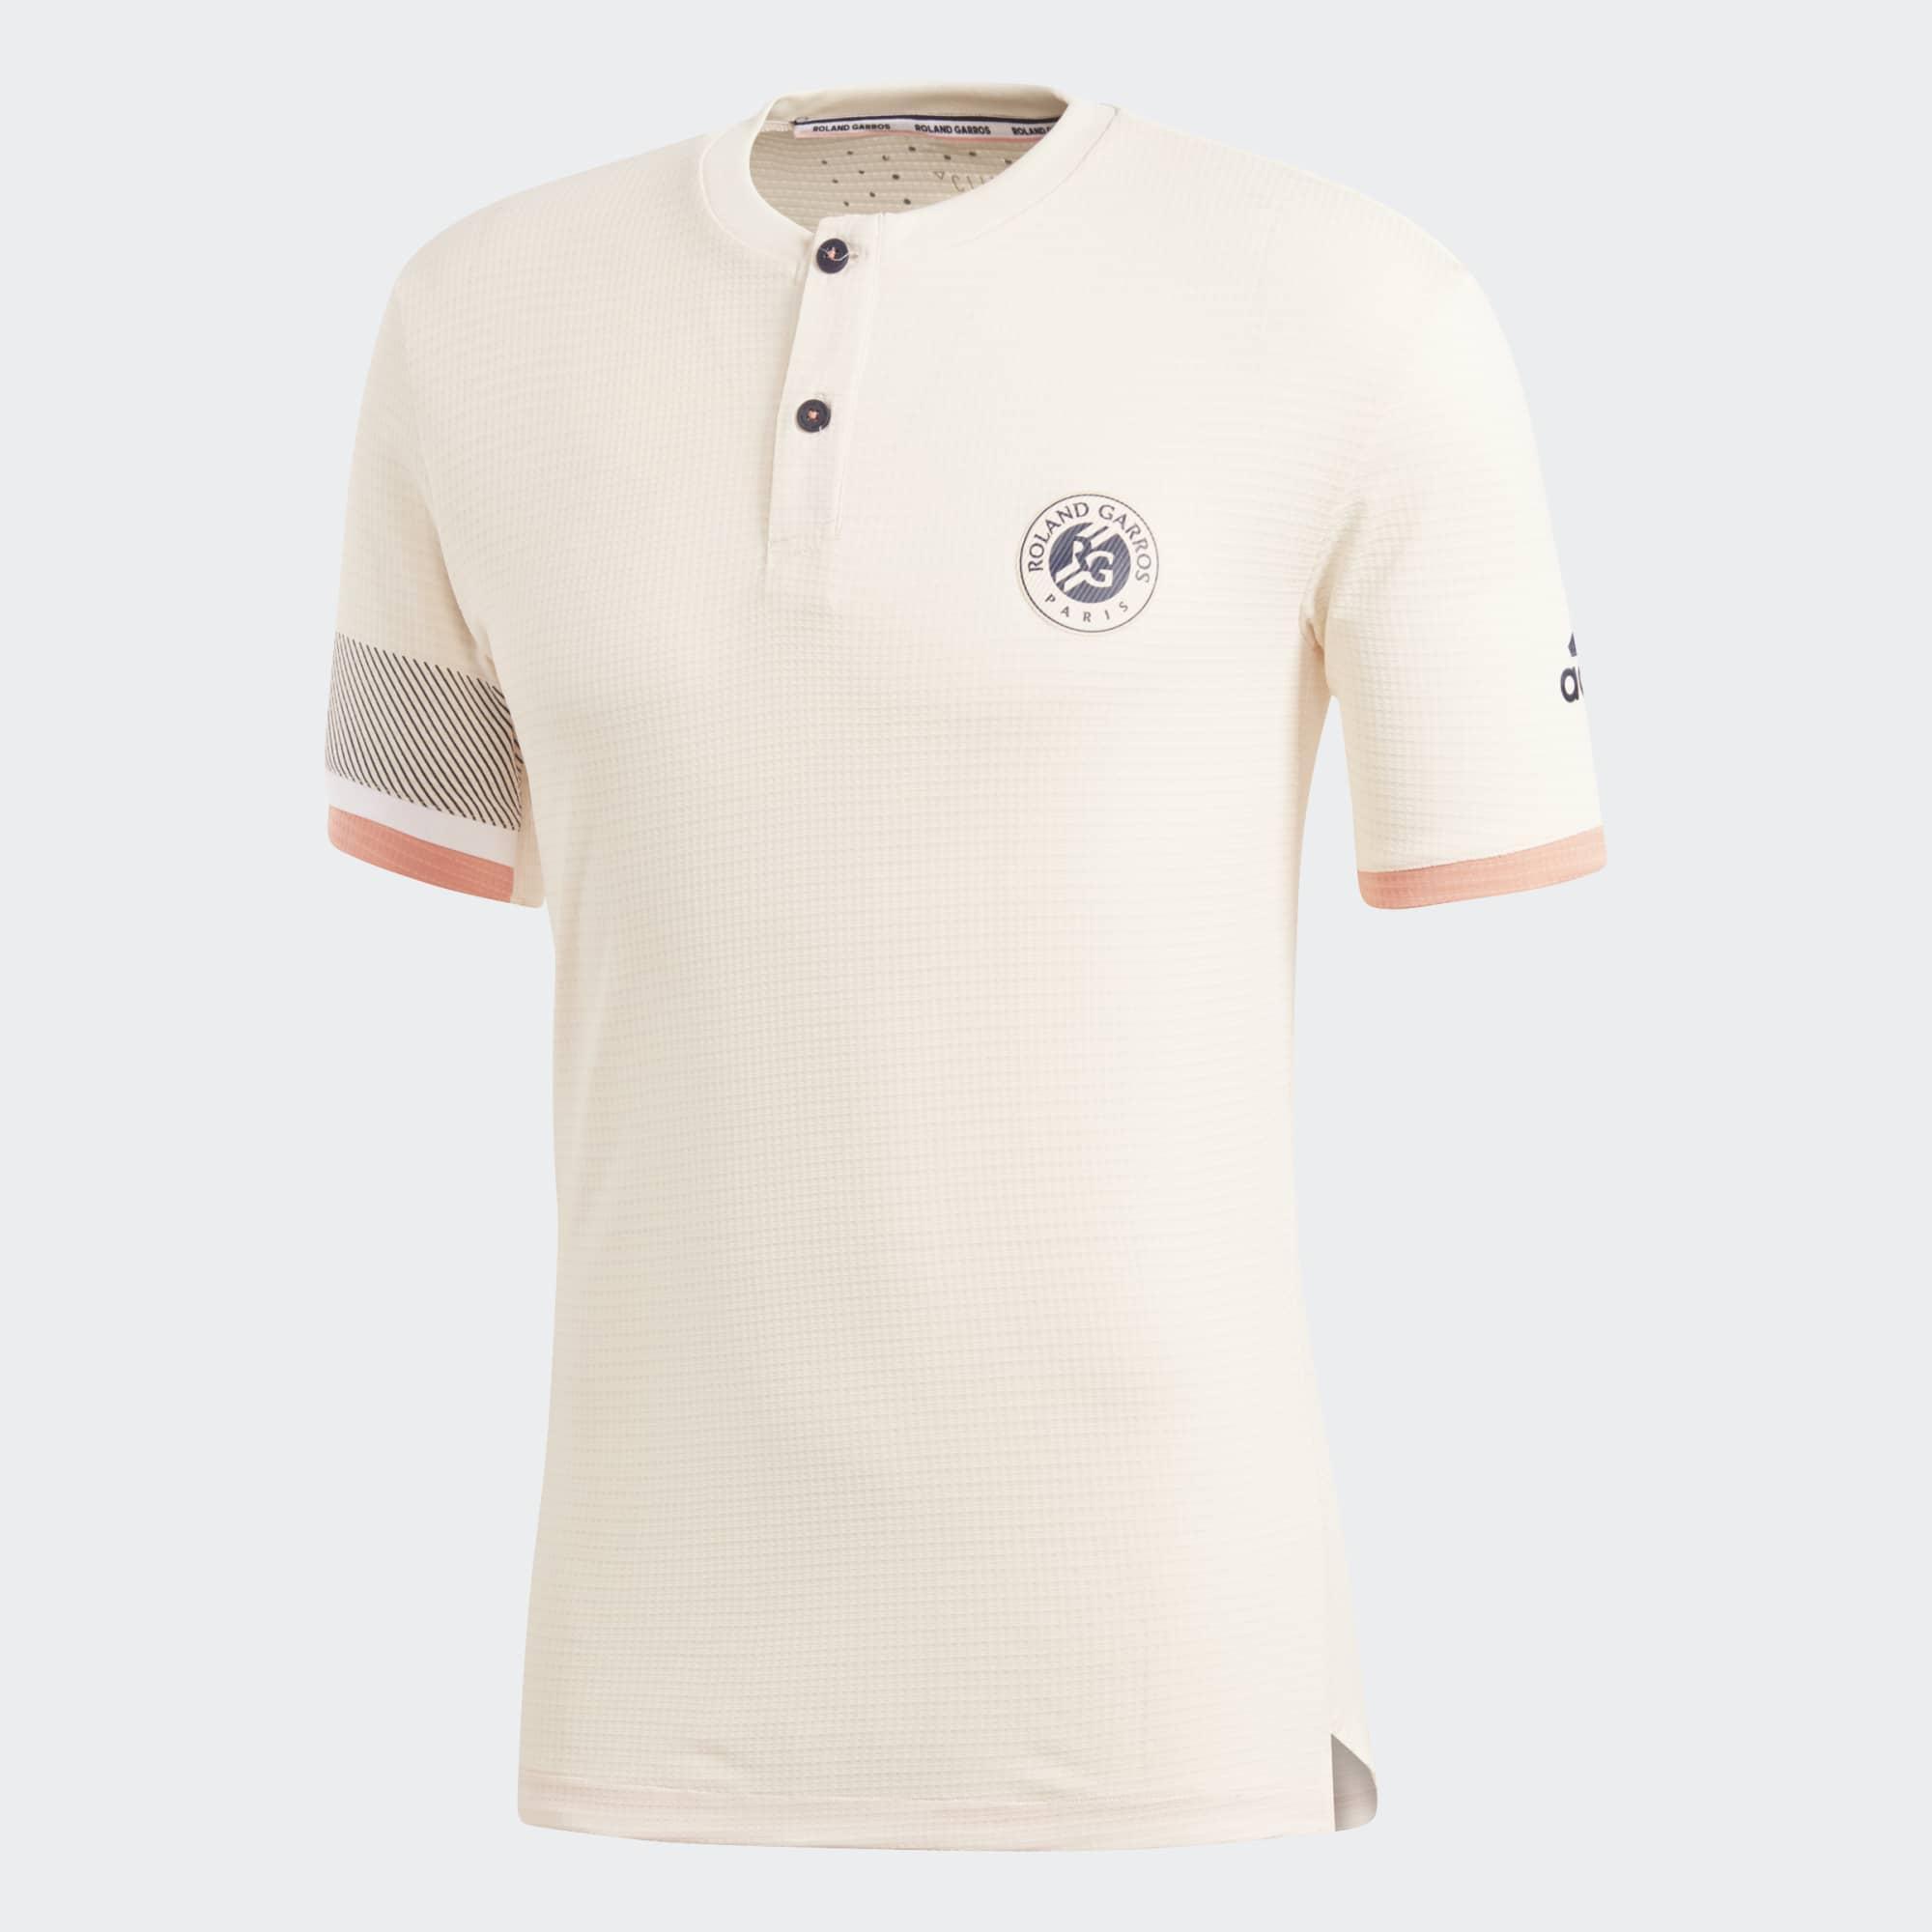 Tee Adidas Ecru Roland Tennis Climachill Mens Tint Garros wAqAYrXxP